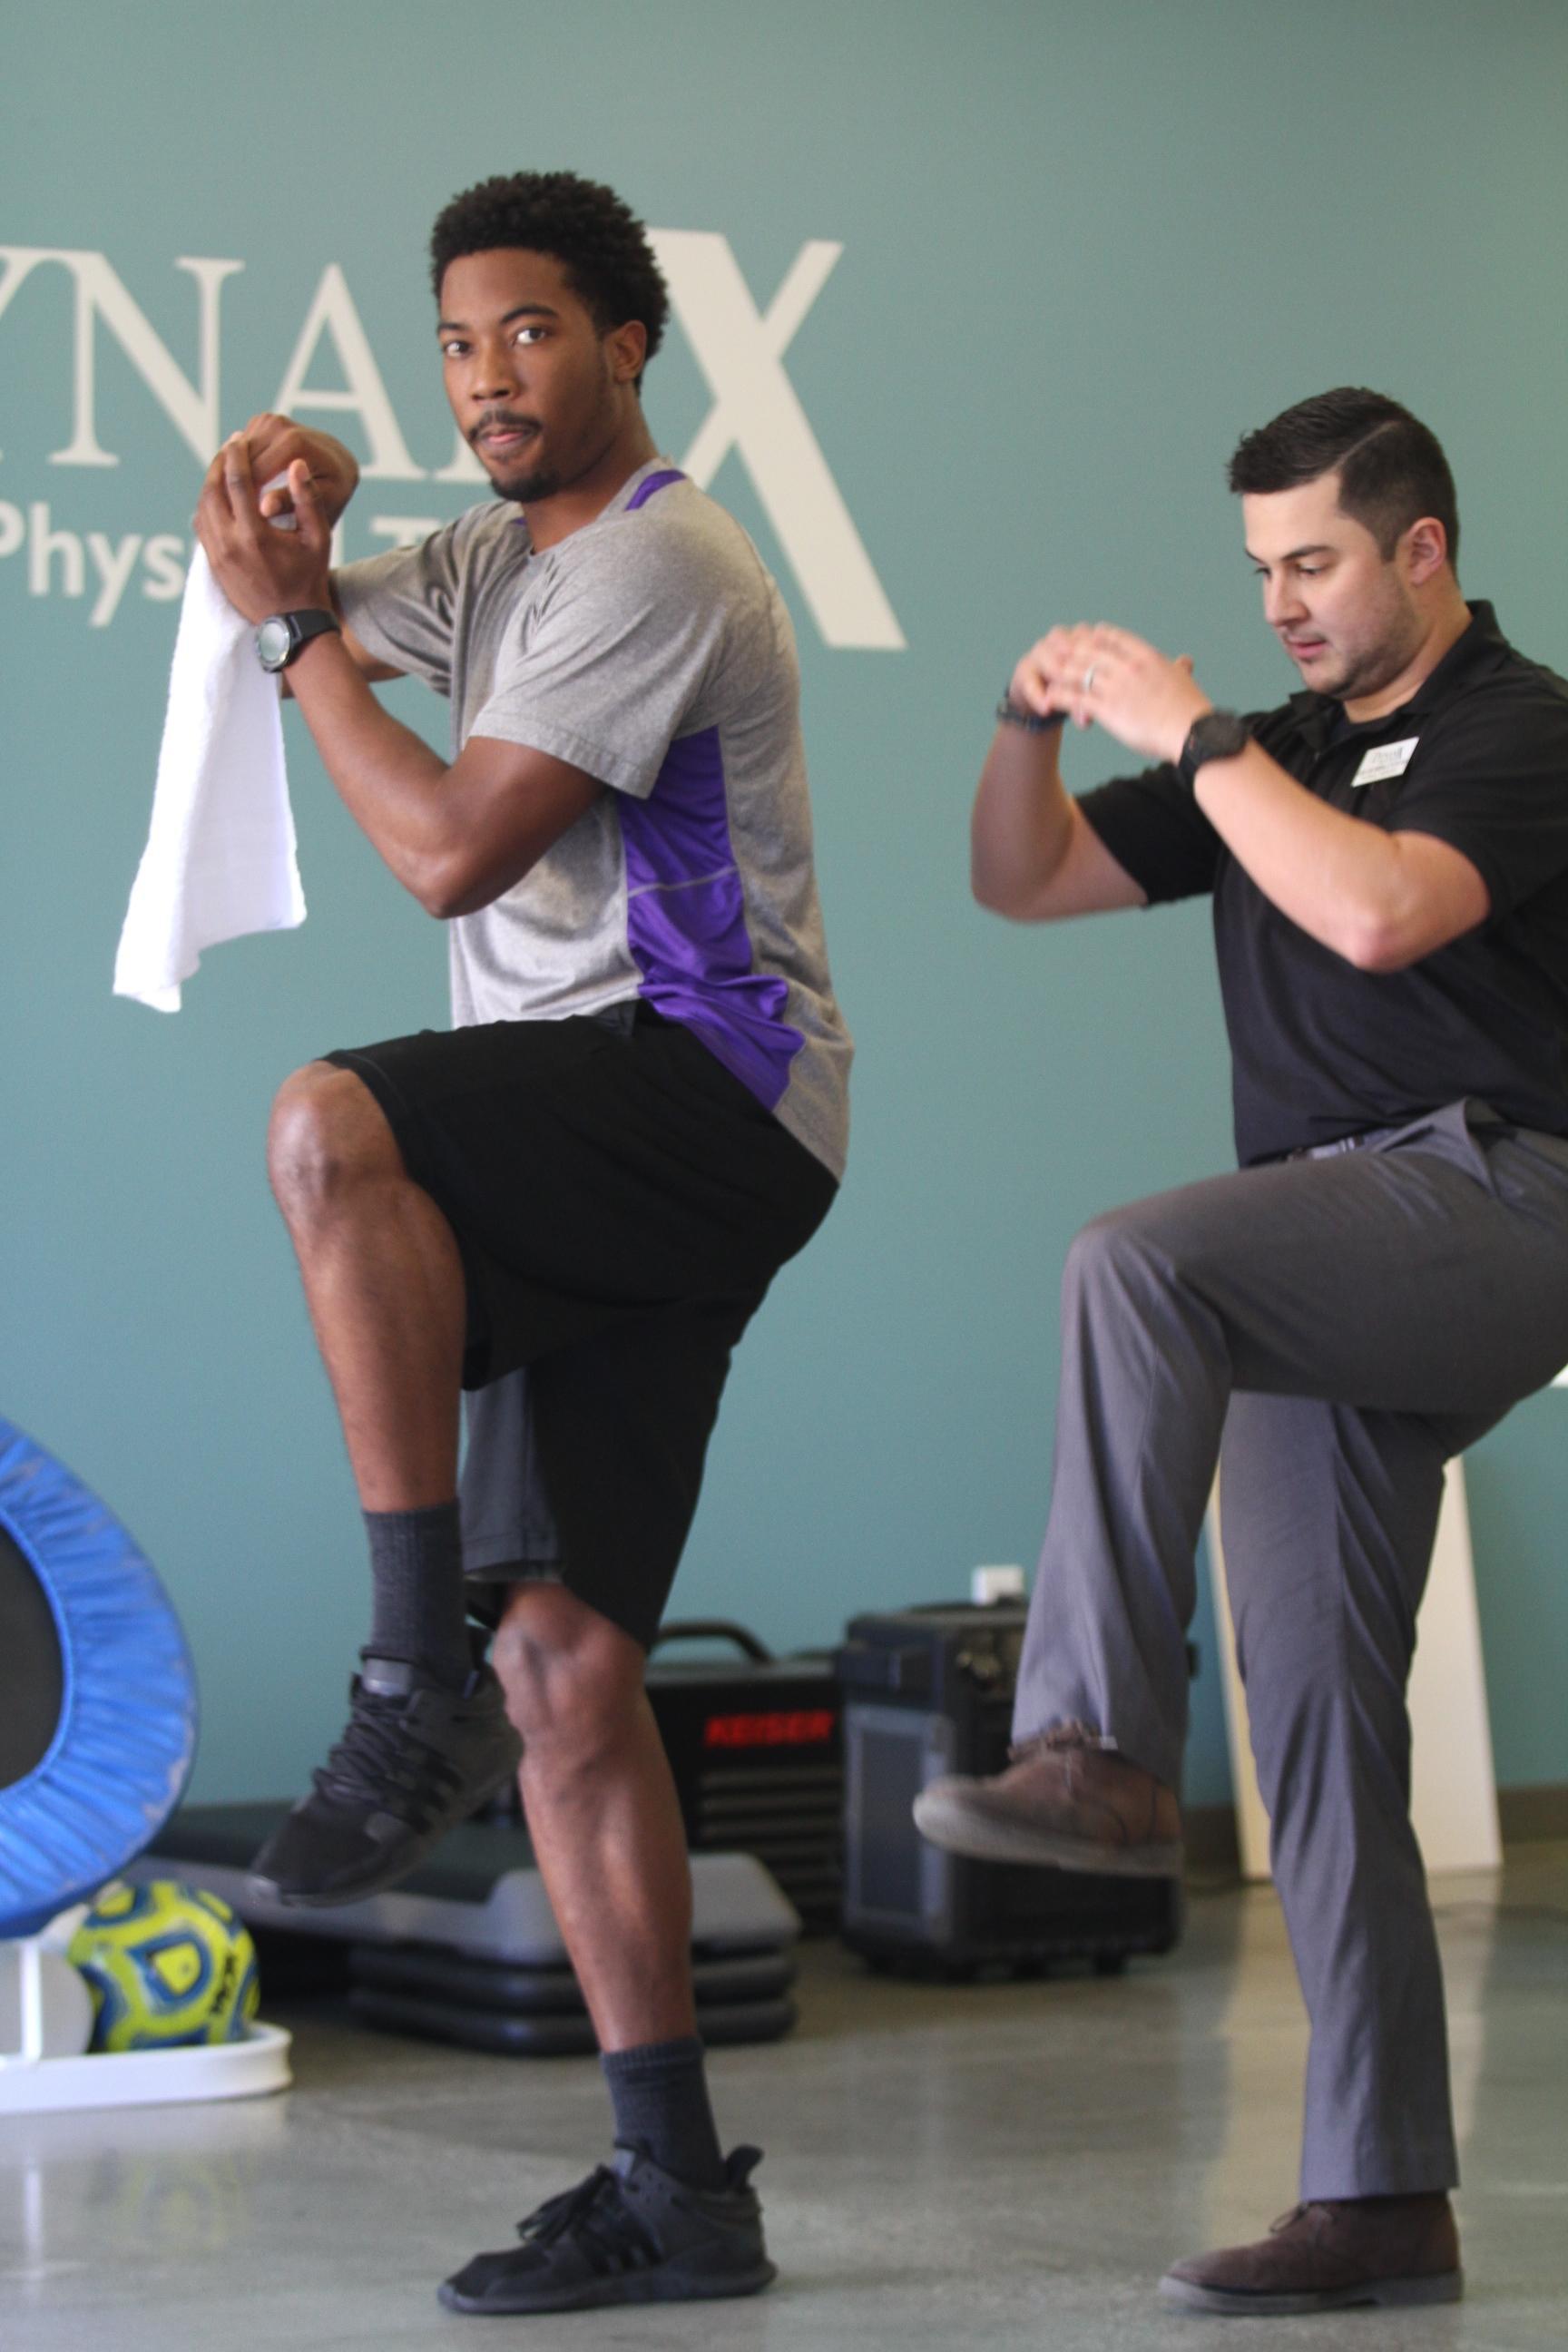 DynamX Physical Therapy Santa Monica image 10